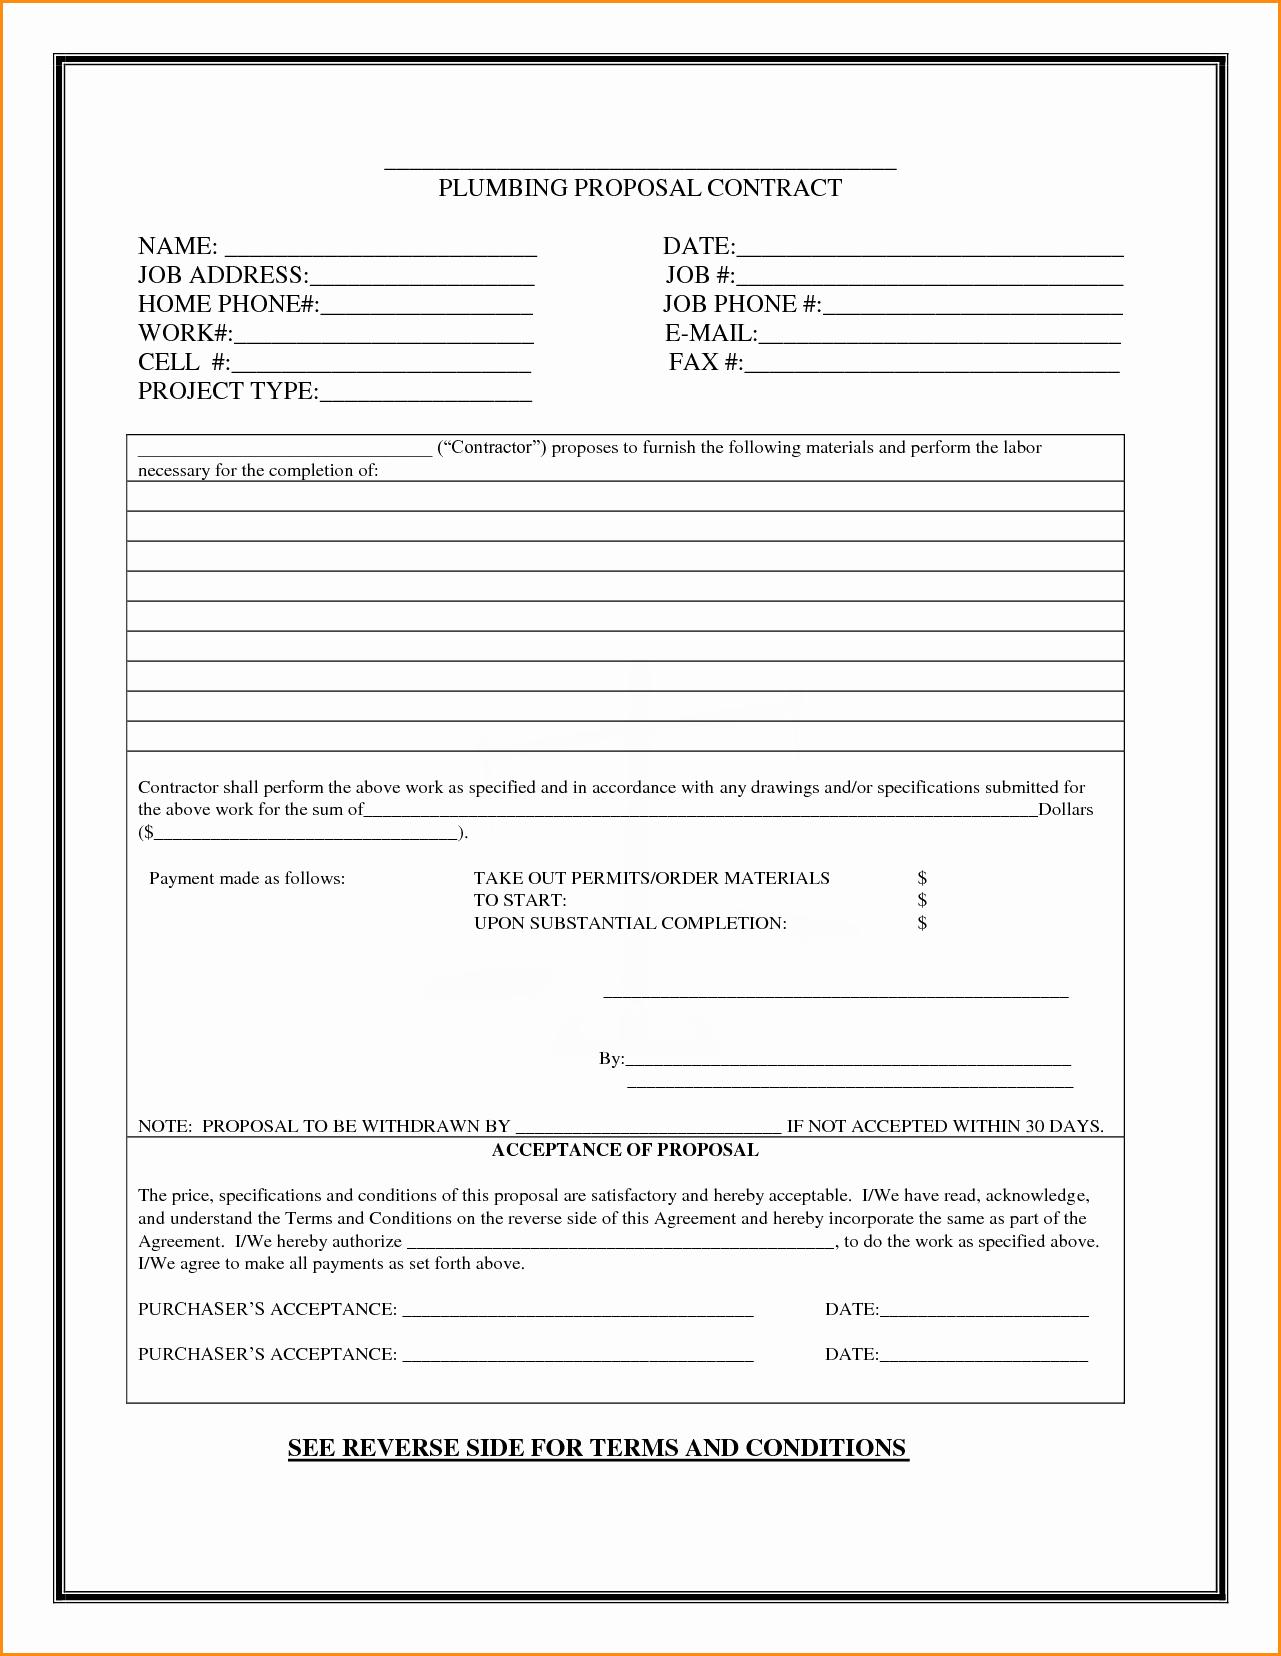 Free Job Proposal Templates New Plumbing Bid Proposal Template